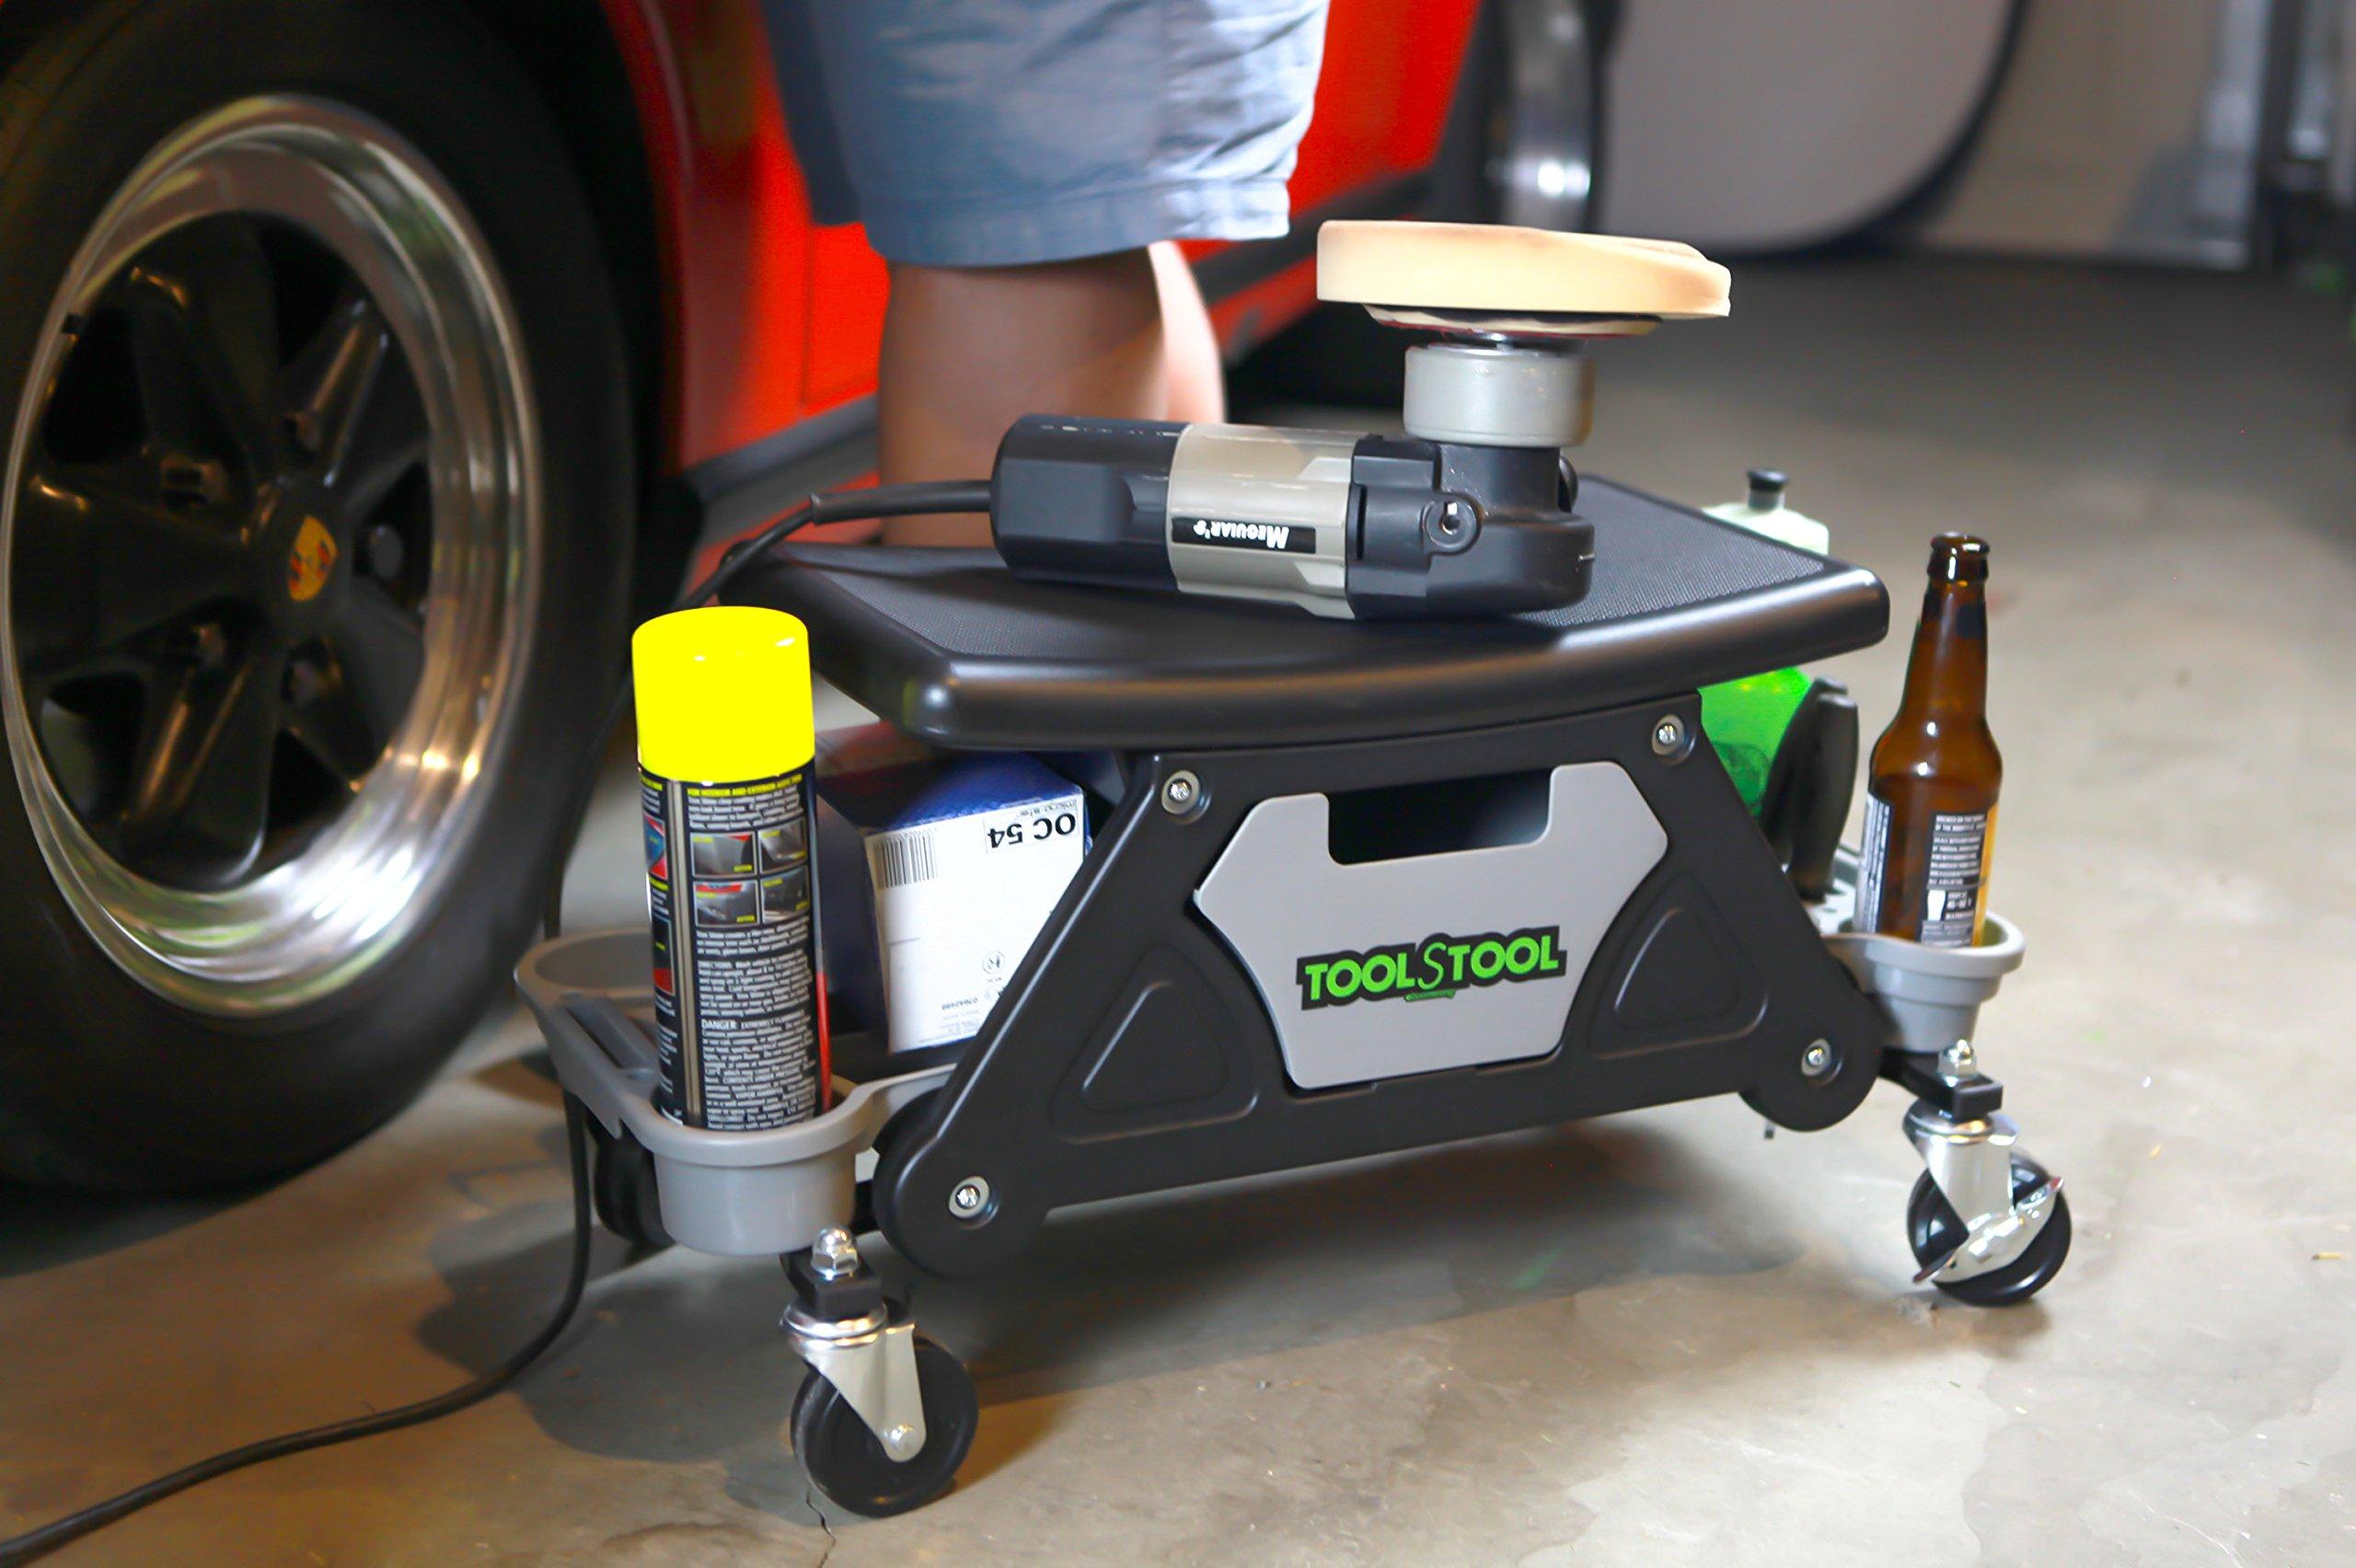 Boomerang ToolStool Roller-Seat Shop-Cart by Boomerang (Image #7)